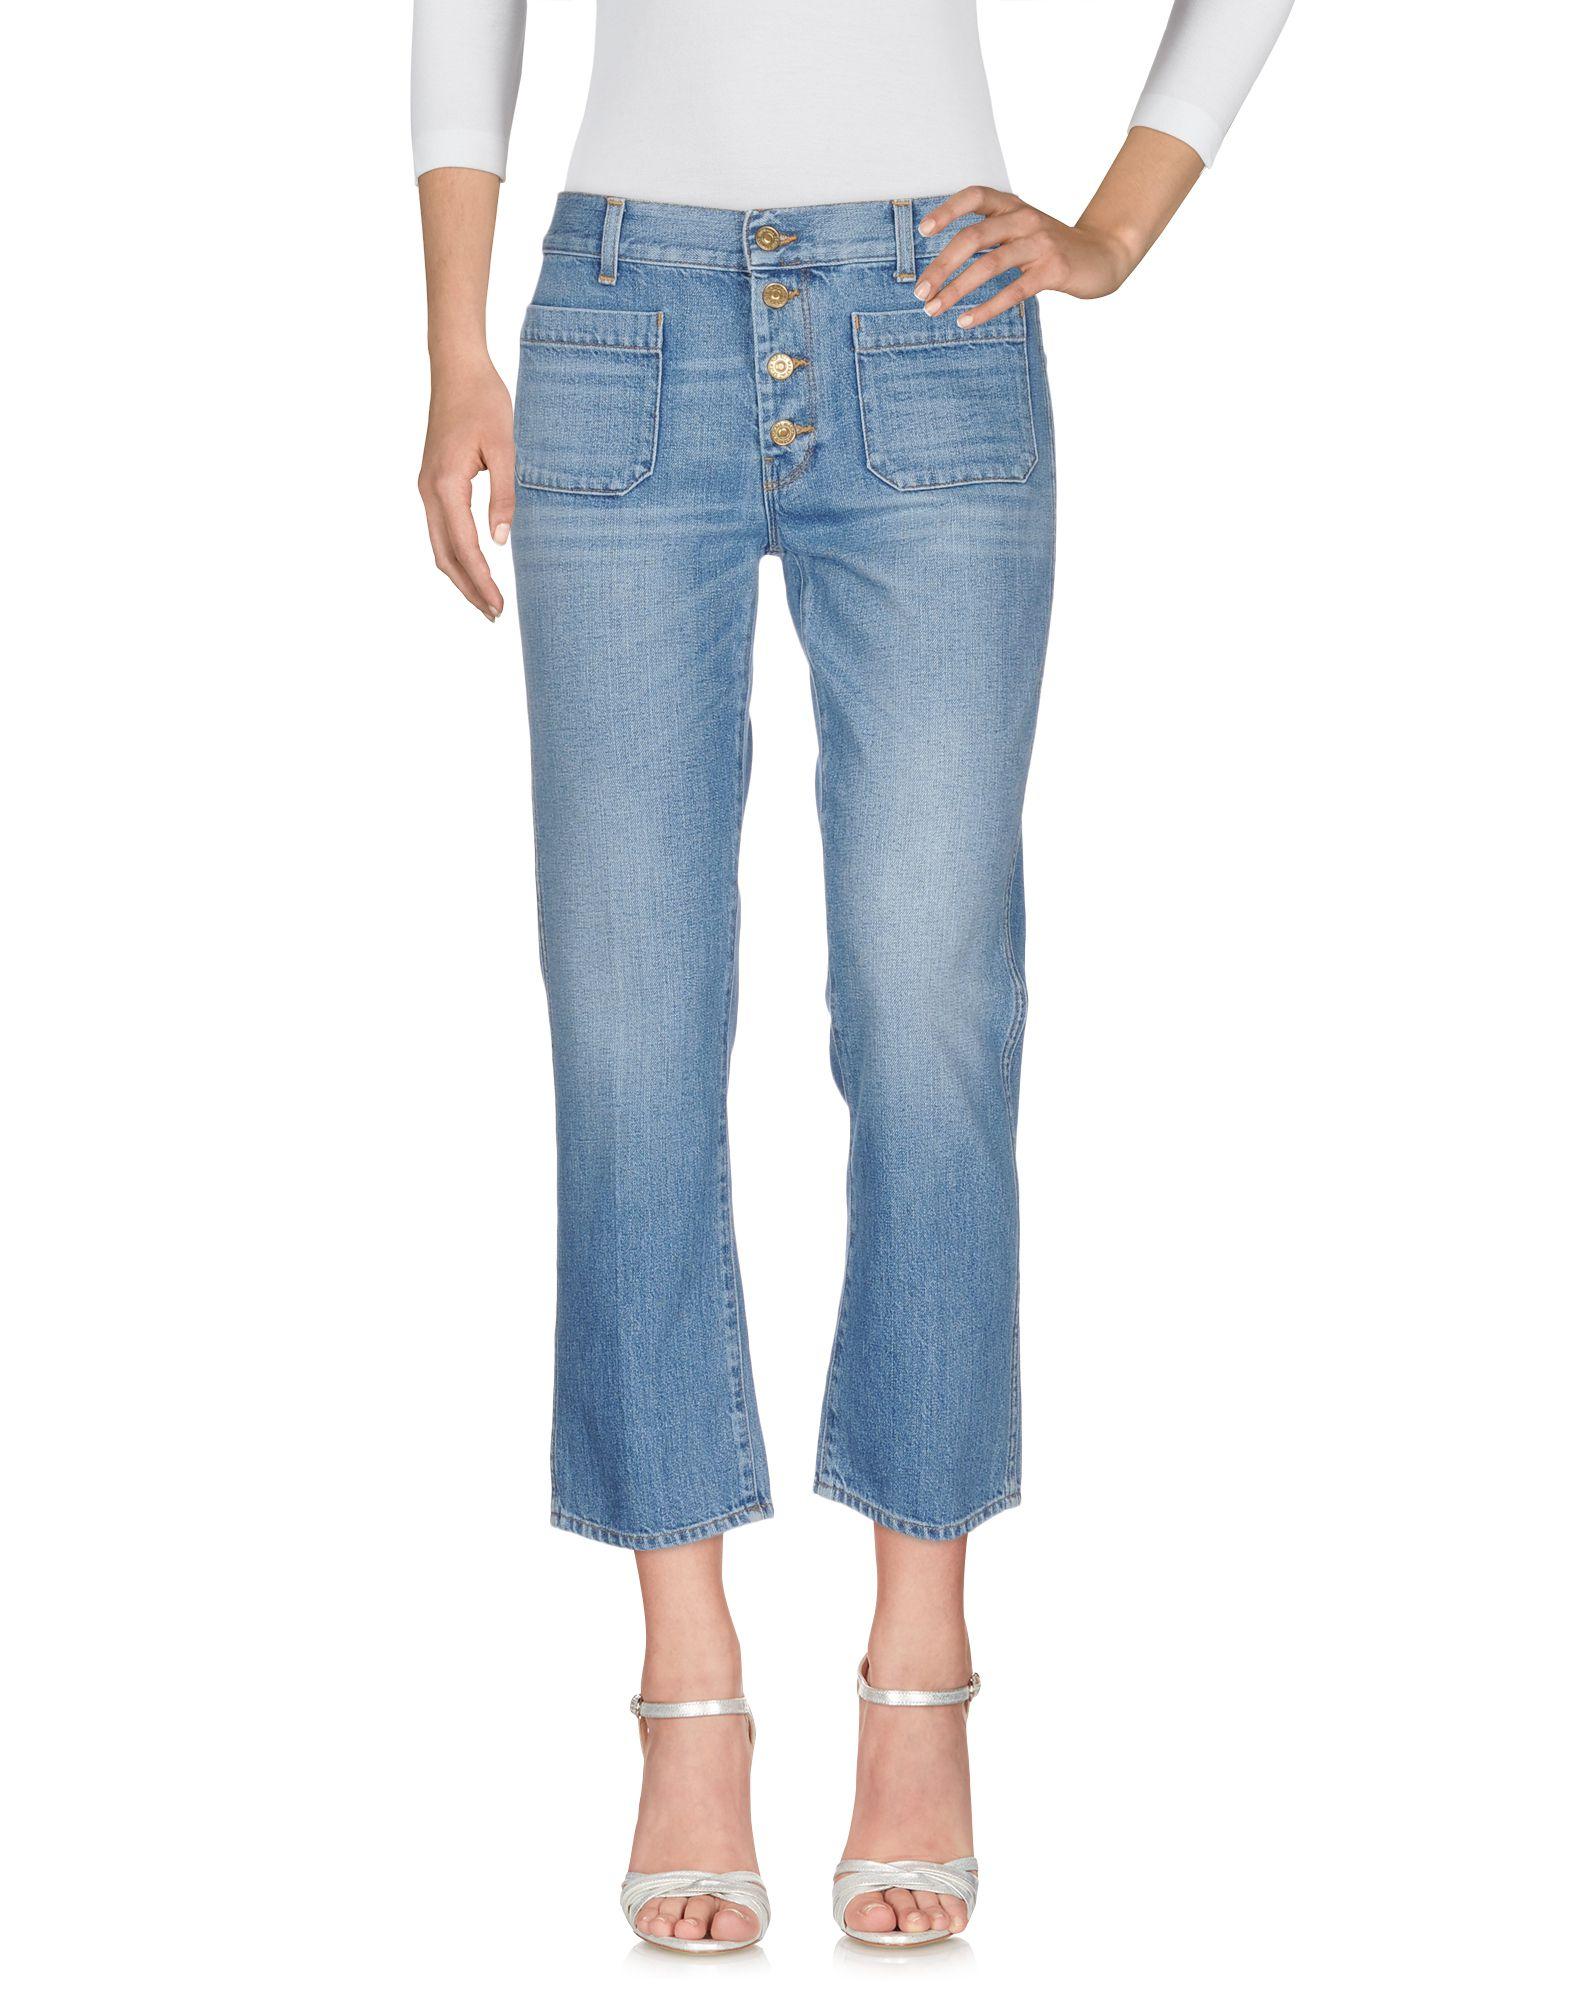 7 FOR ALL MANKIND Джинсовые брюки женские брюки лэйт светлый размер 56